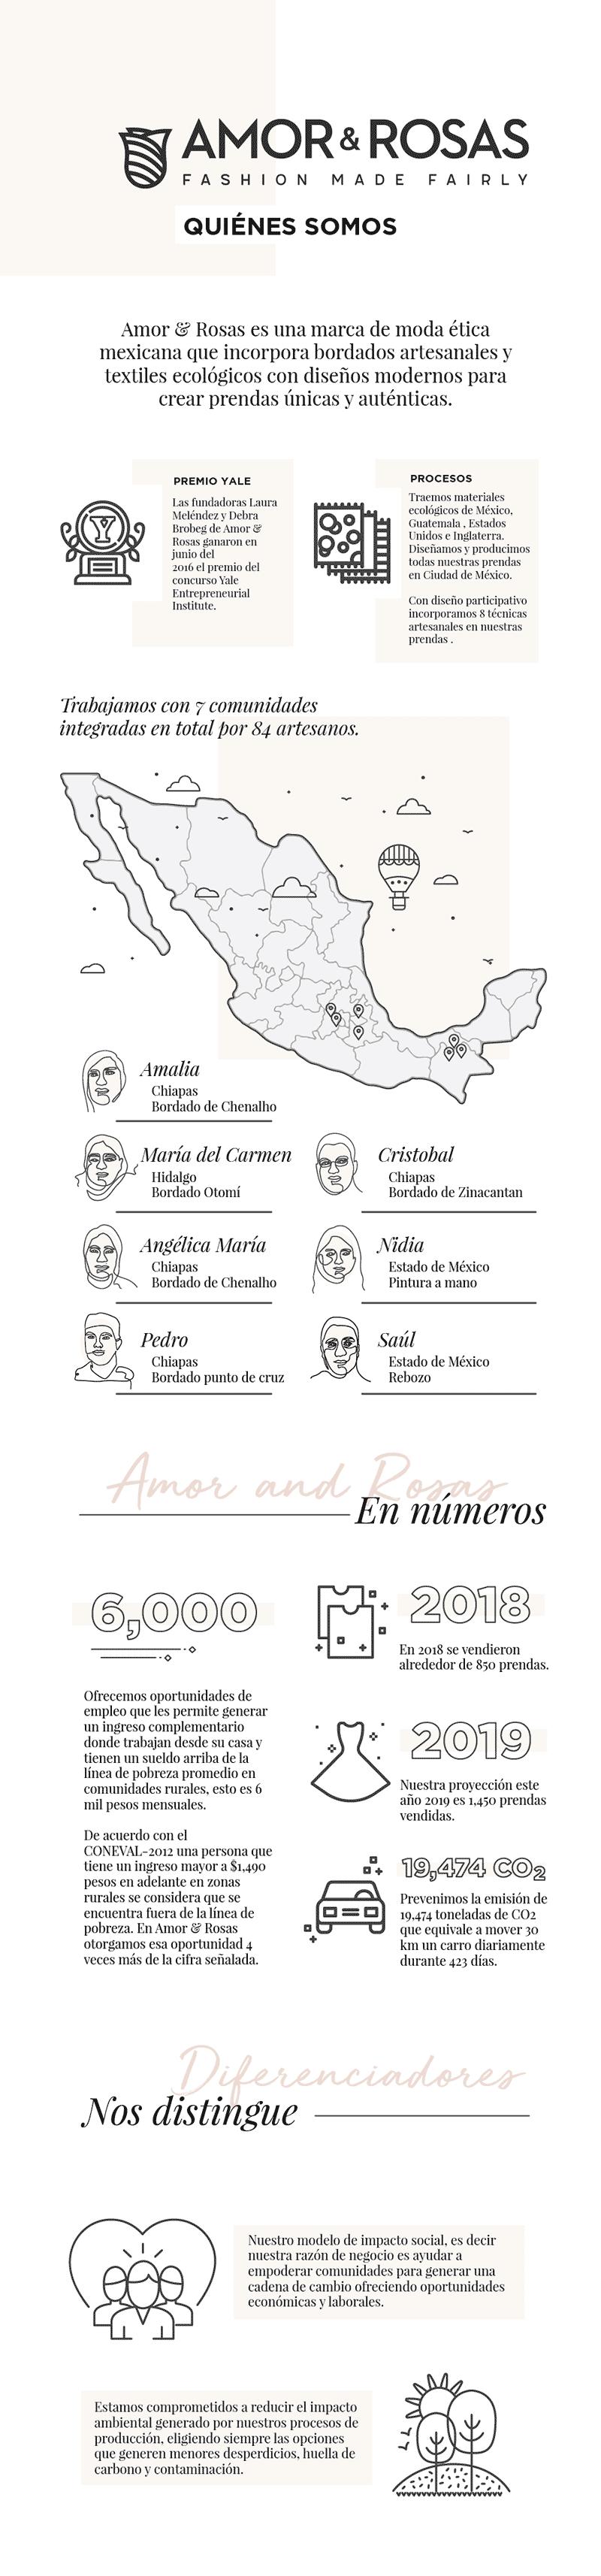 infografia-01.png